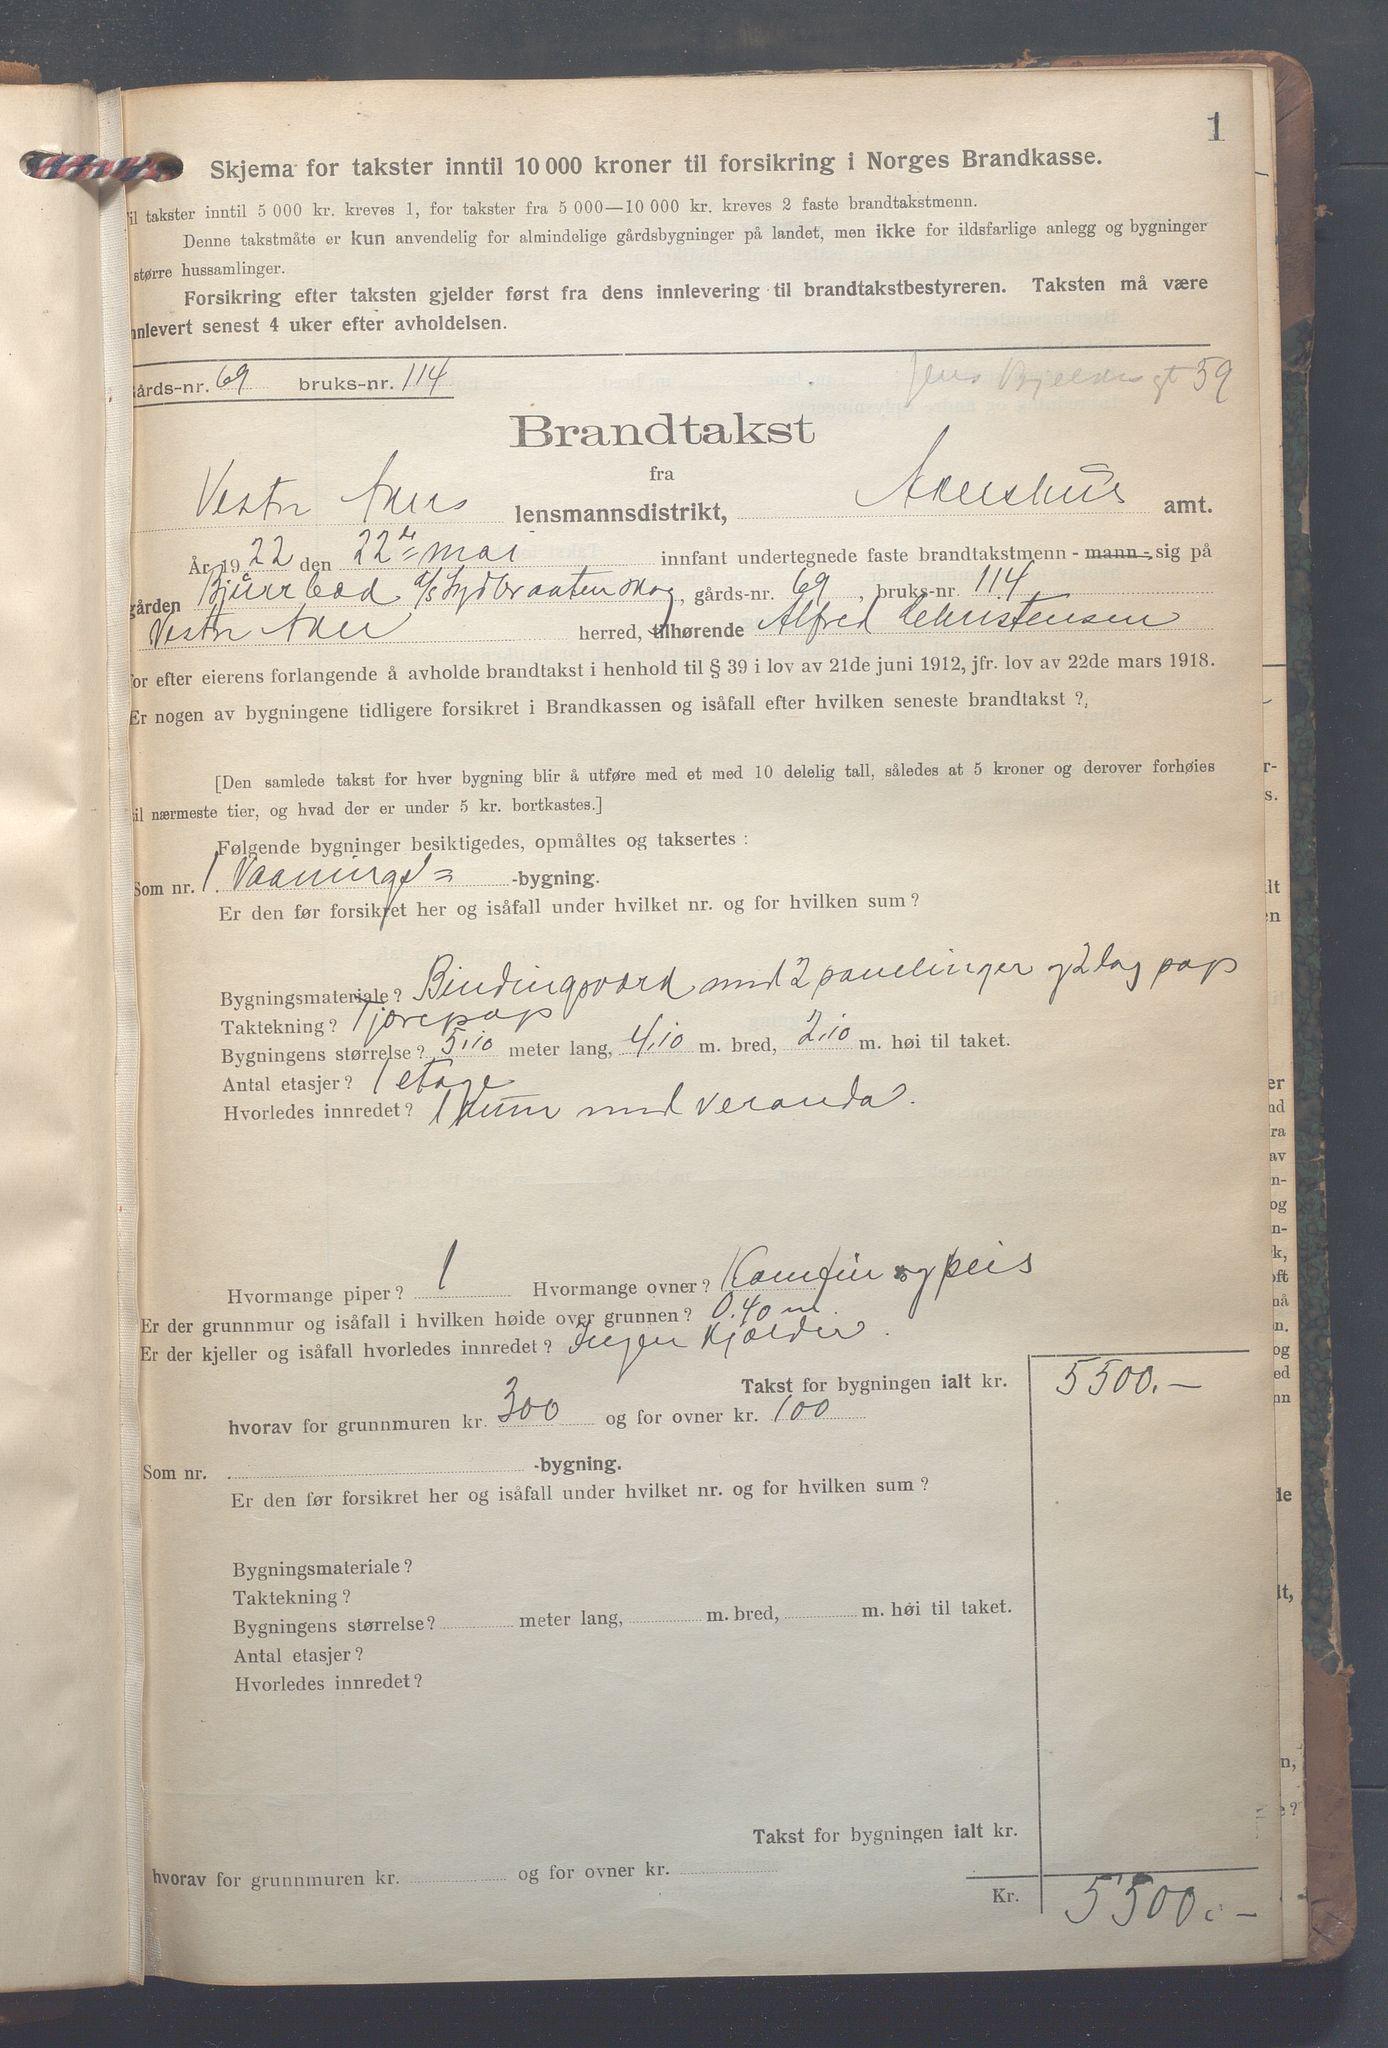 OBA, Lensmennene i Aker, F/Fa/L0022: Branntakstprotokoll, 1922-1949, p. 1